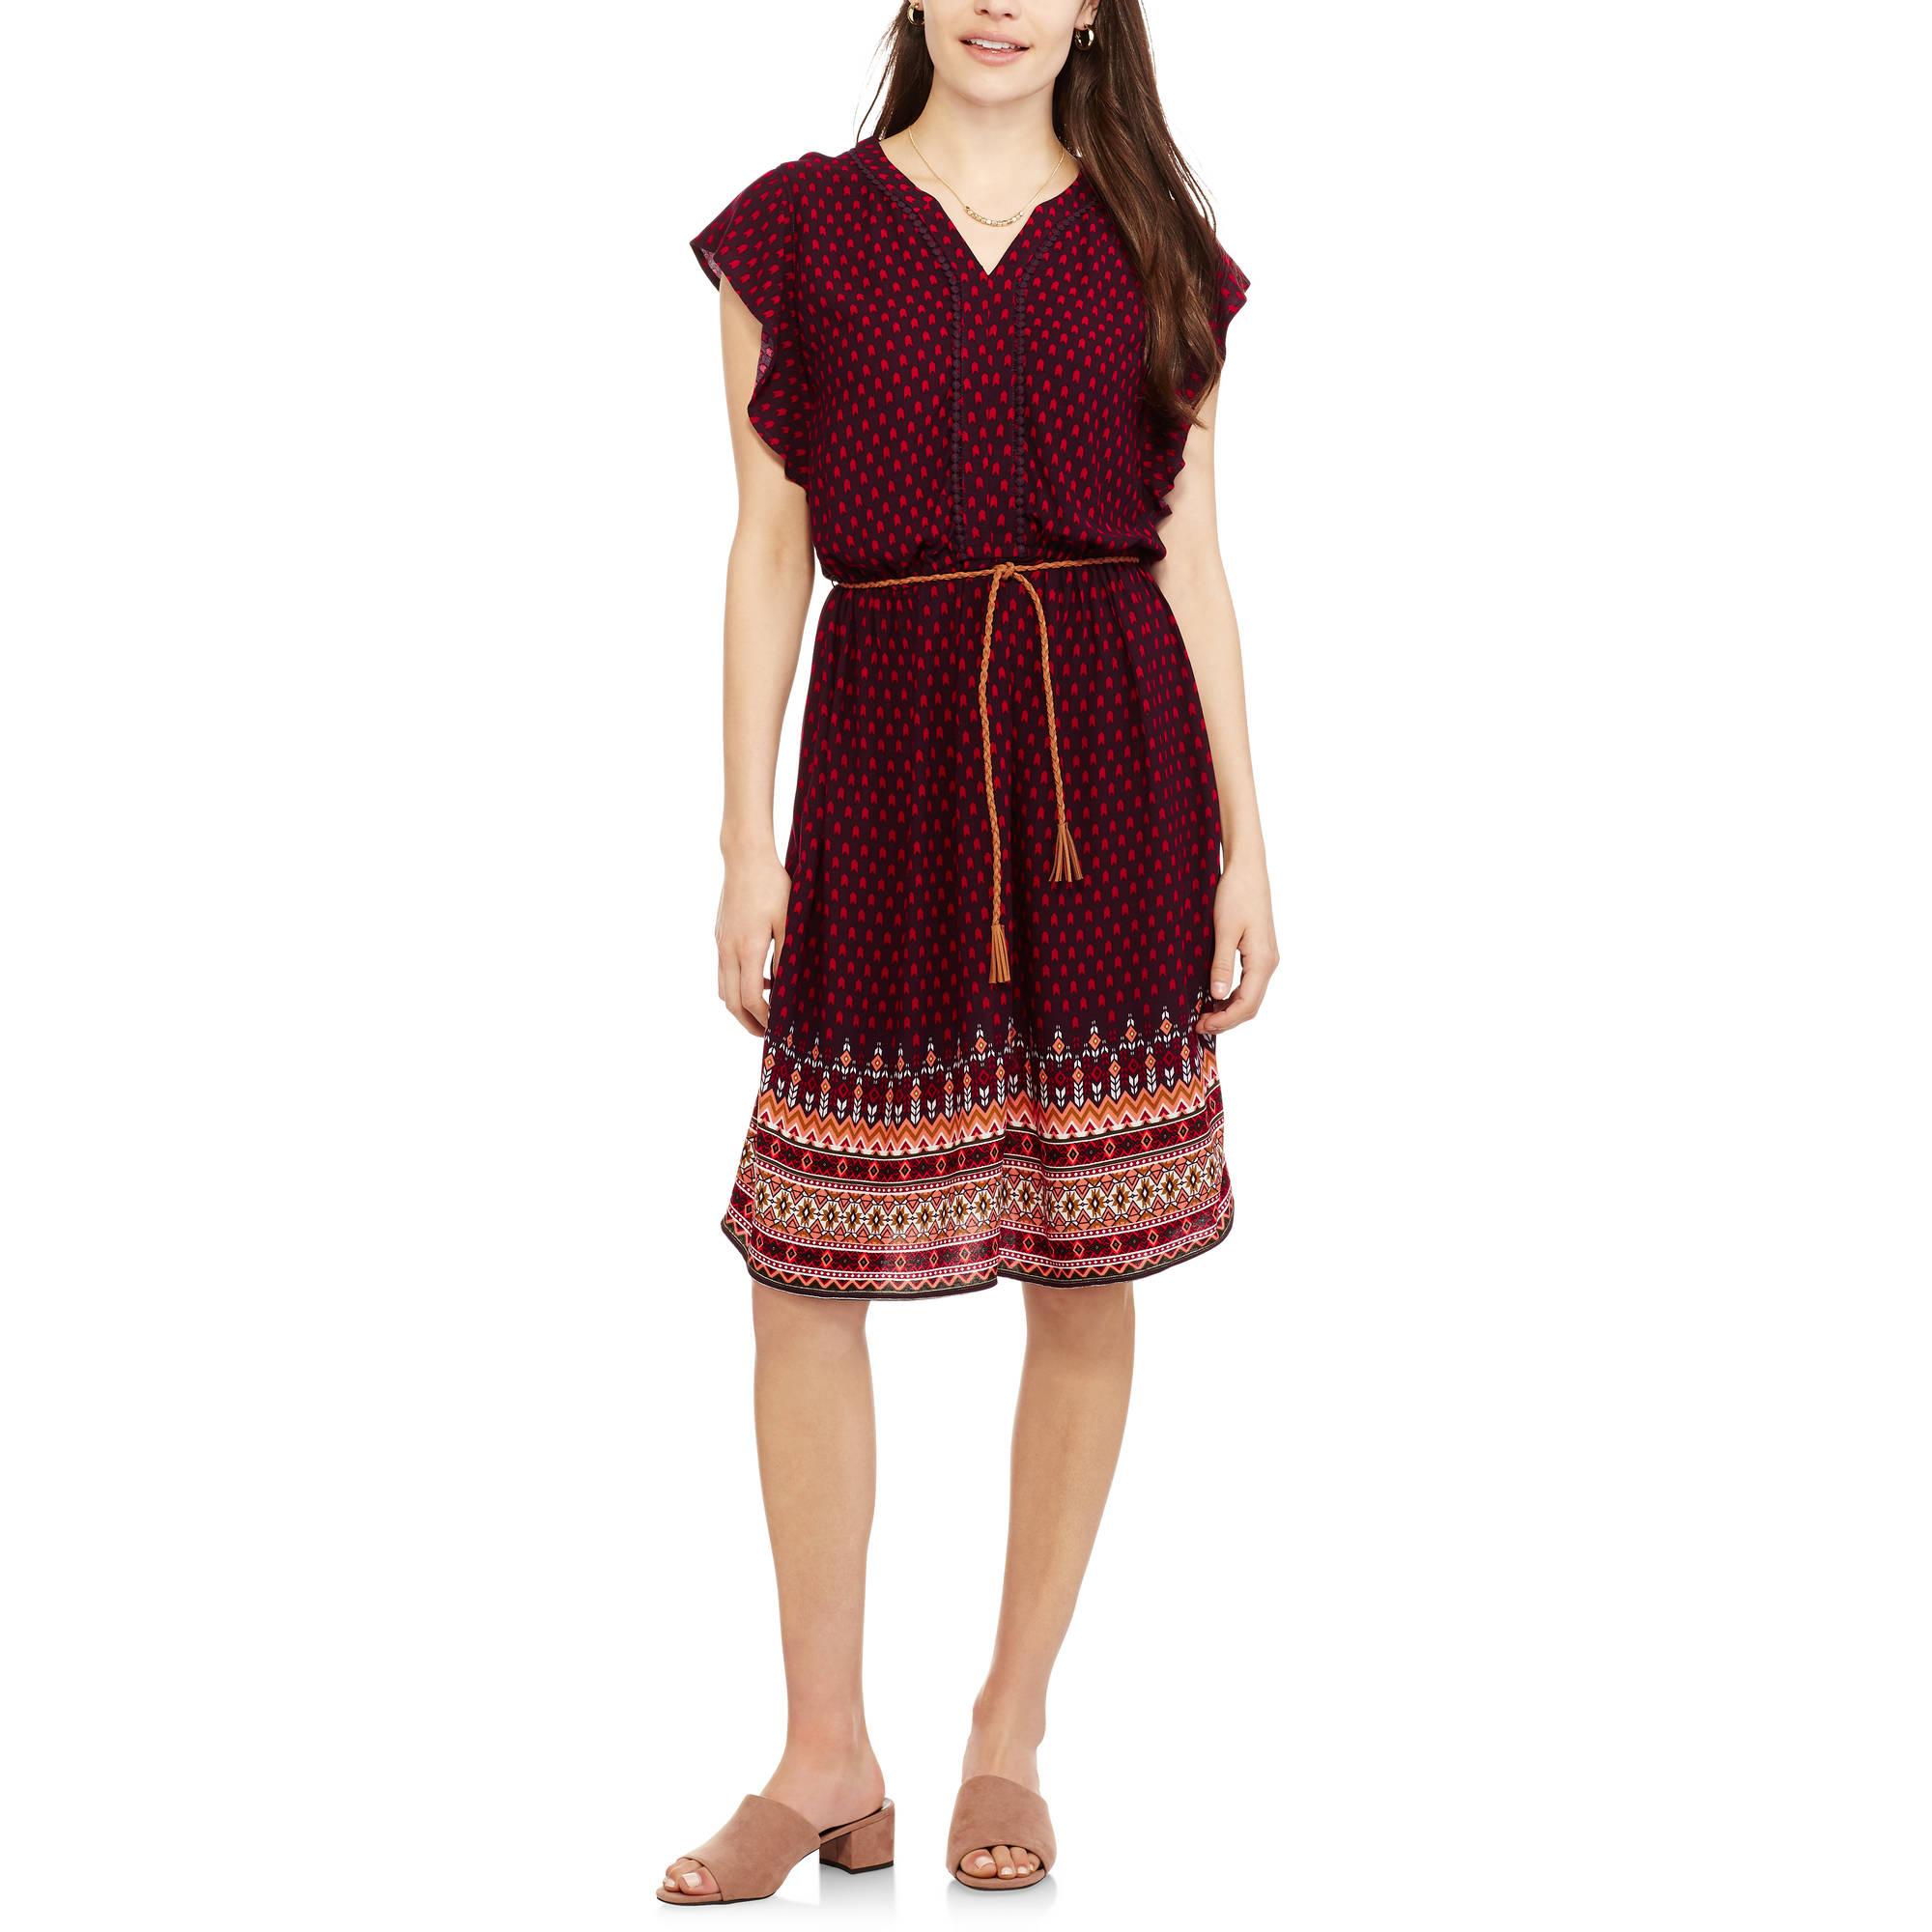 Women's Dresses - Walmart.com